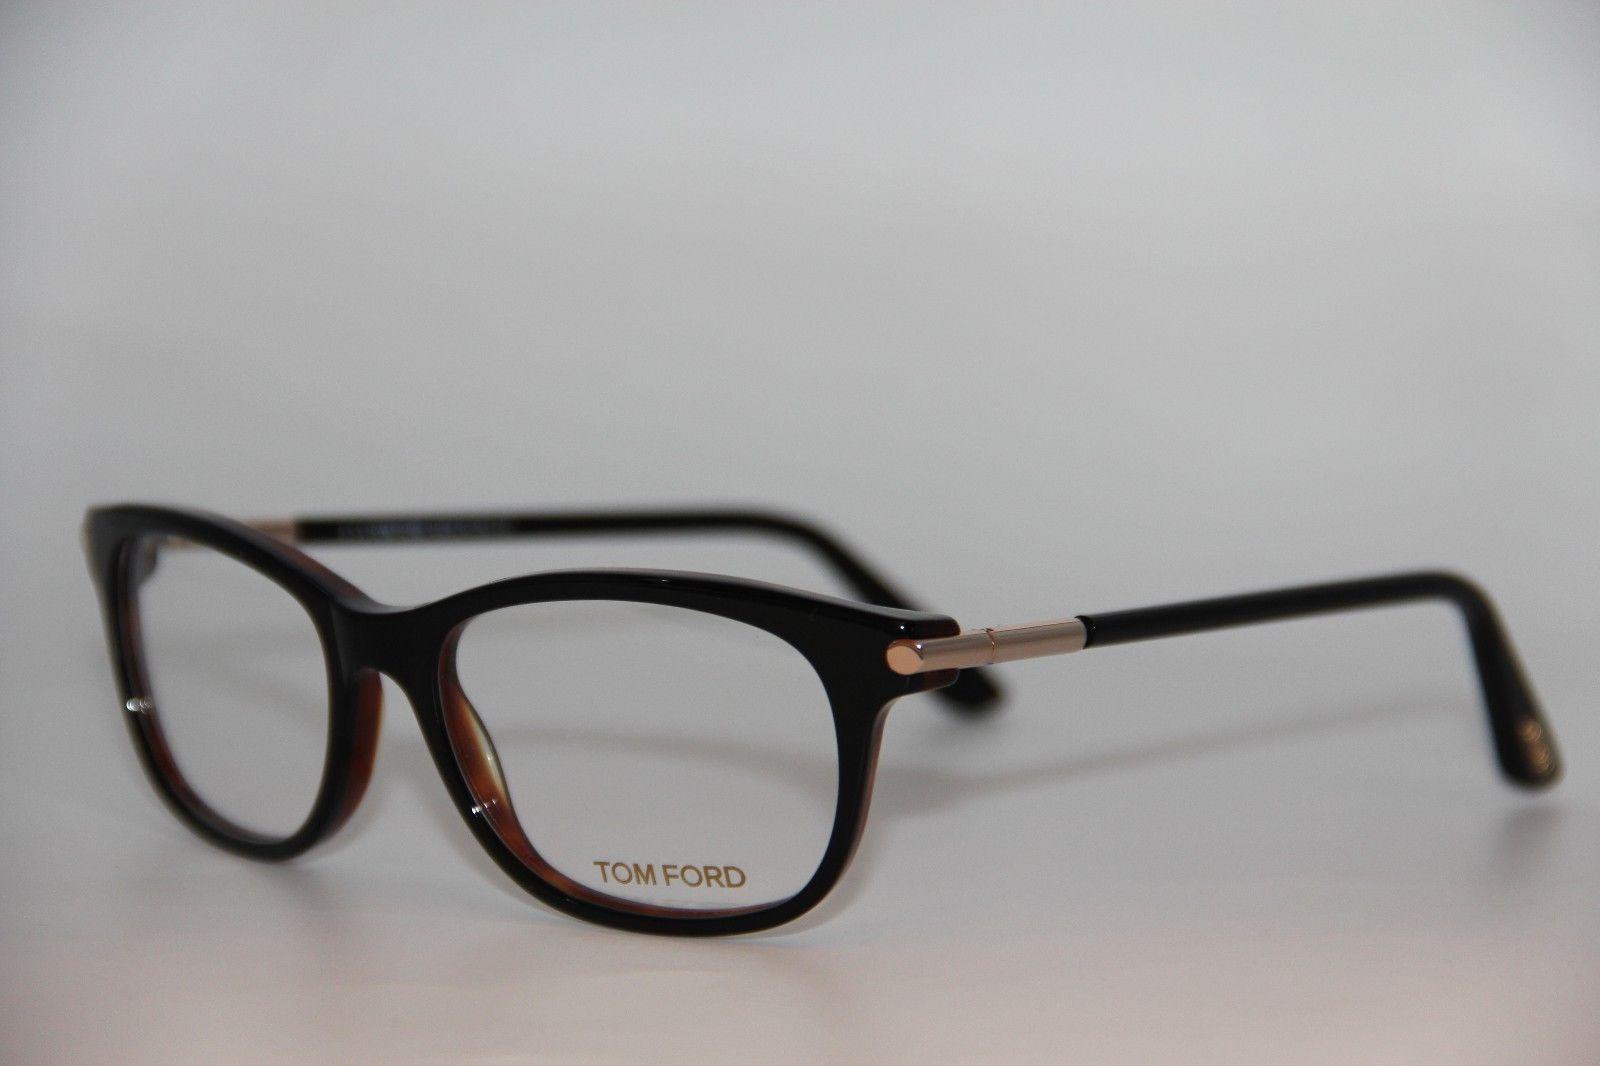 198da55858 New Tom Ford Tf 5237 001 Black Eyeglasses and 14 similar items. 57